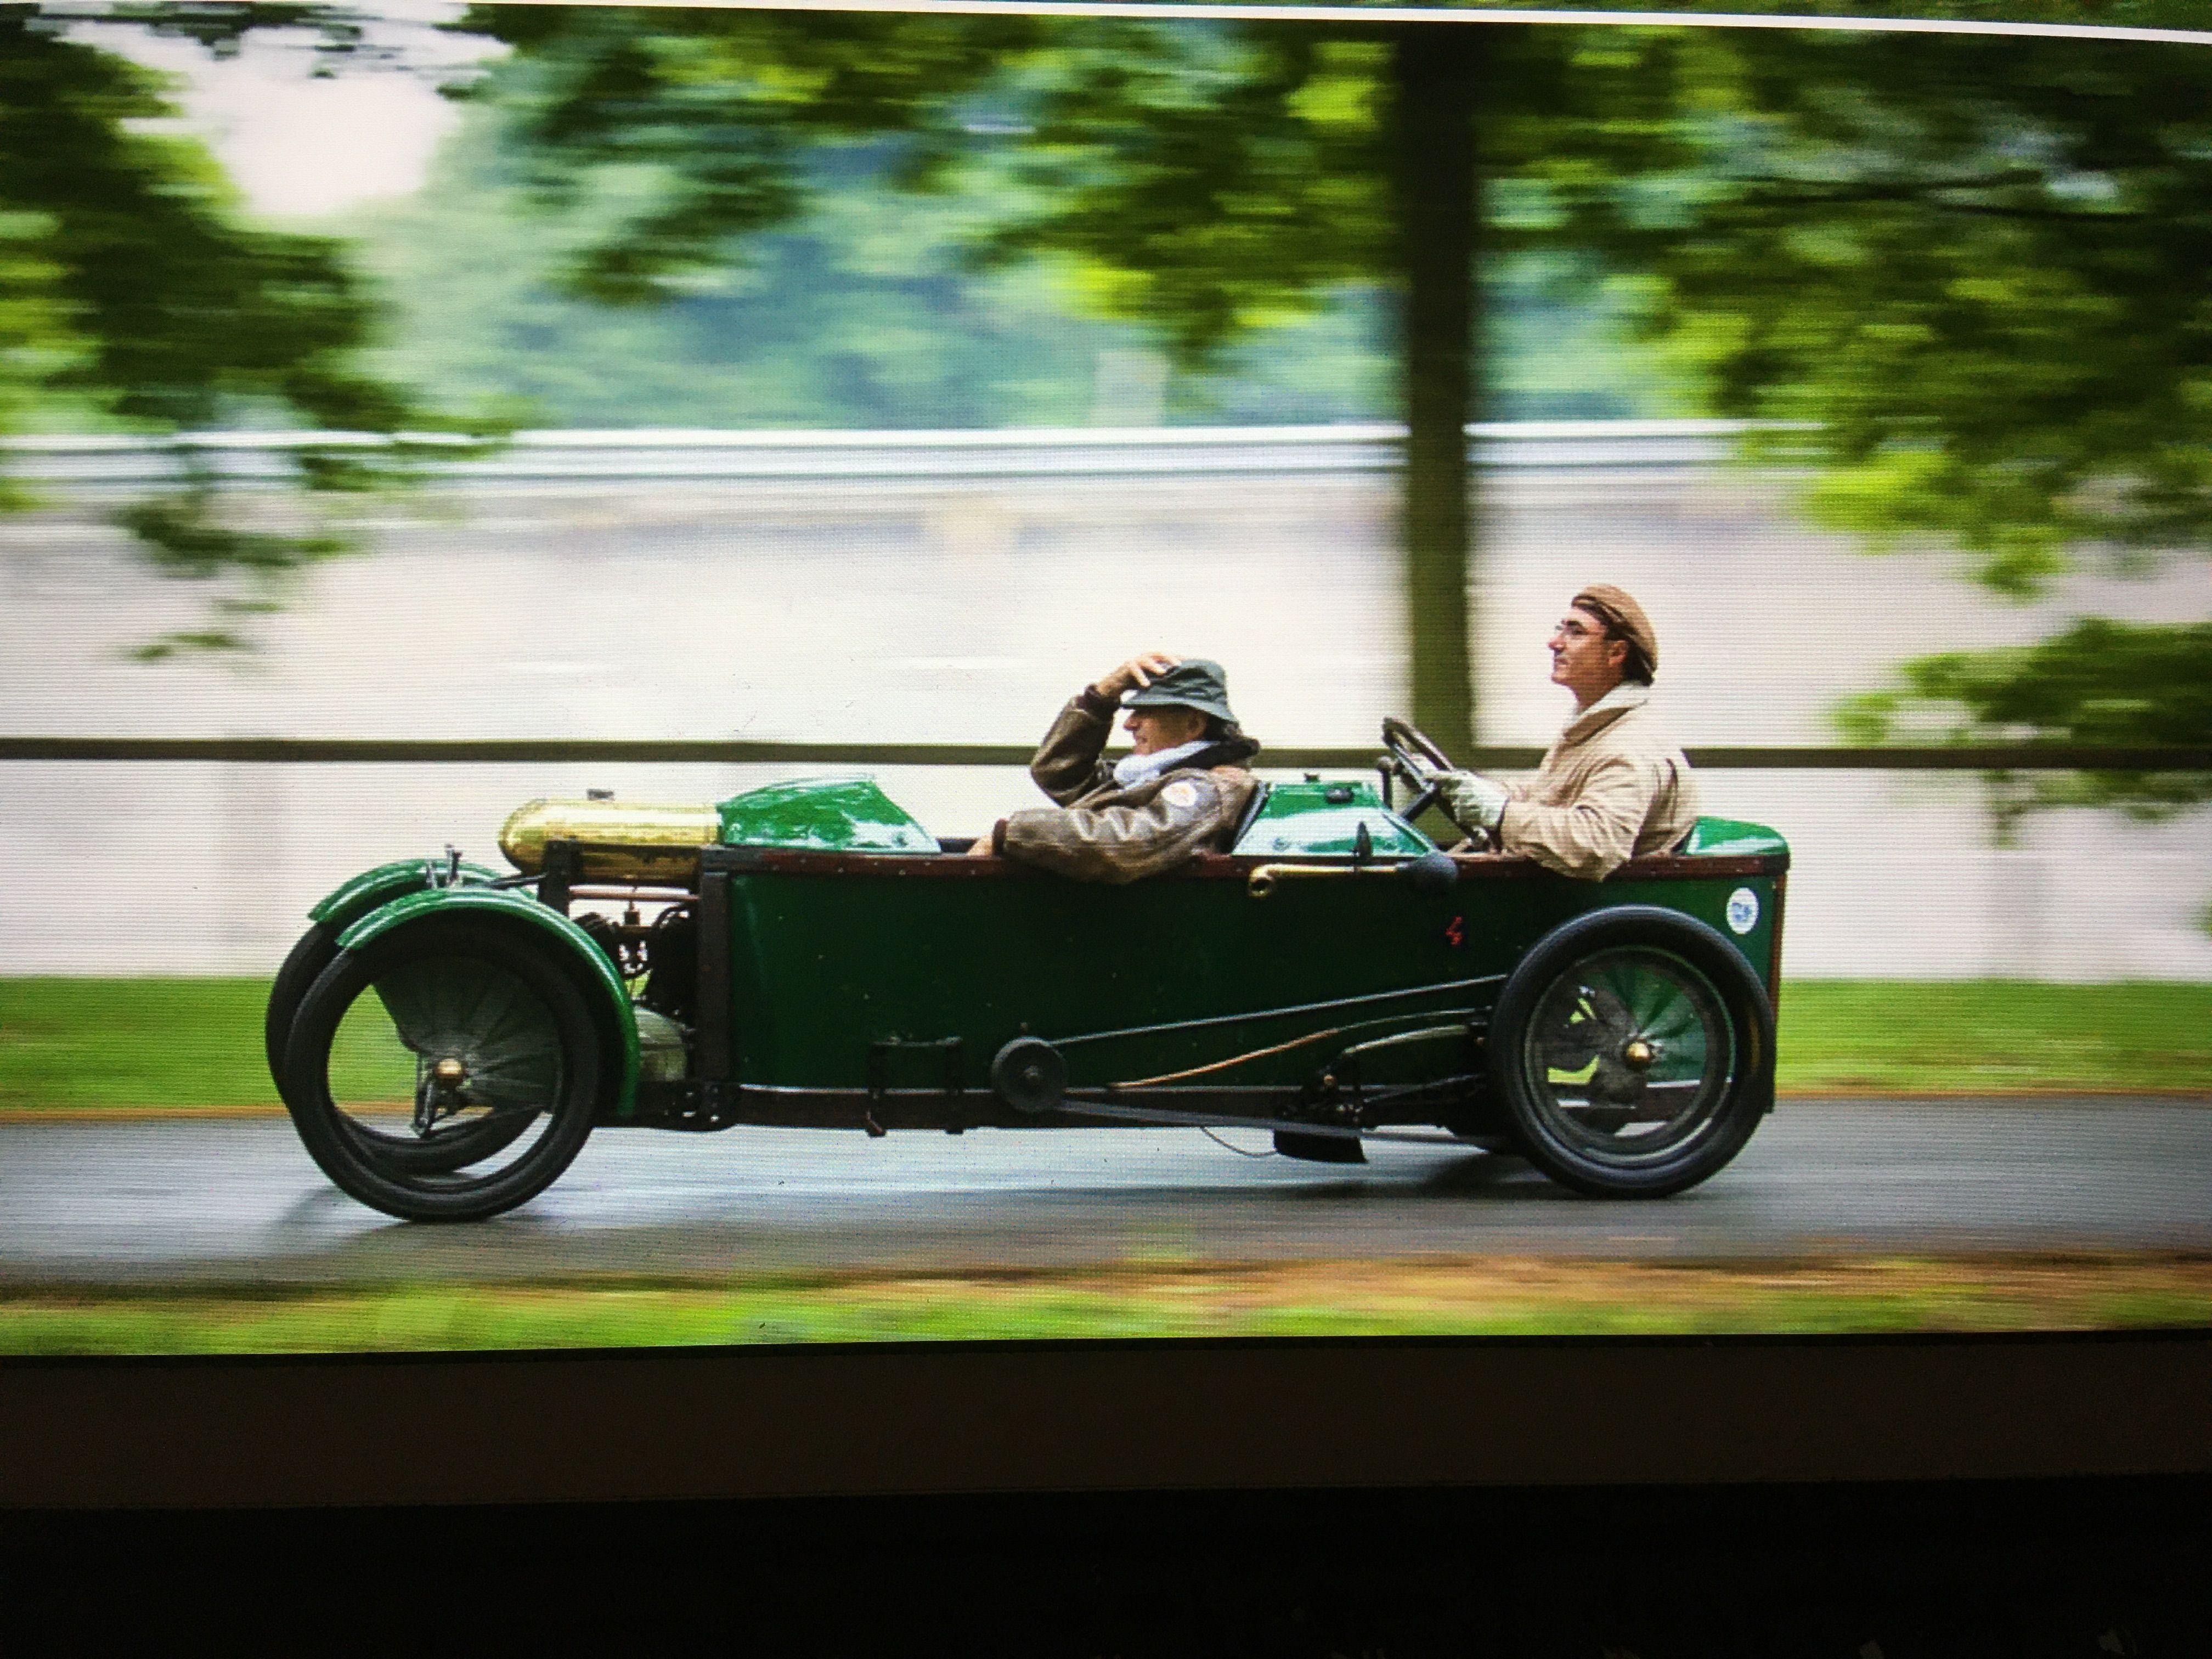 ifa f8 kombi | Antique cars, Old cars, European cars